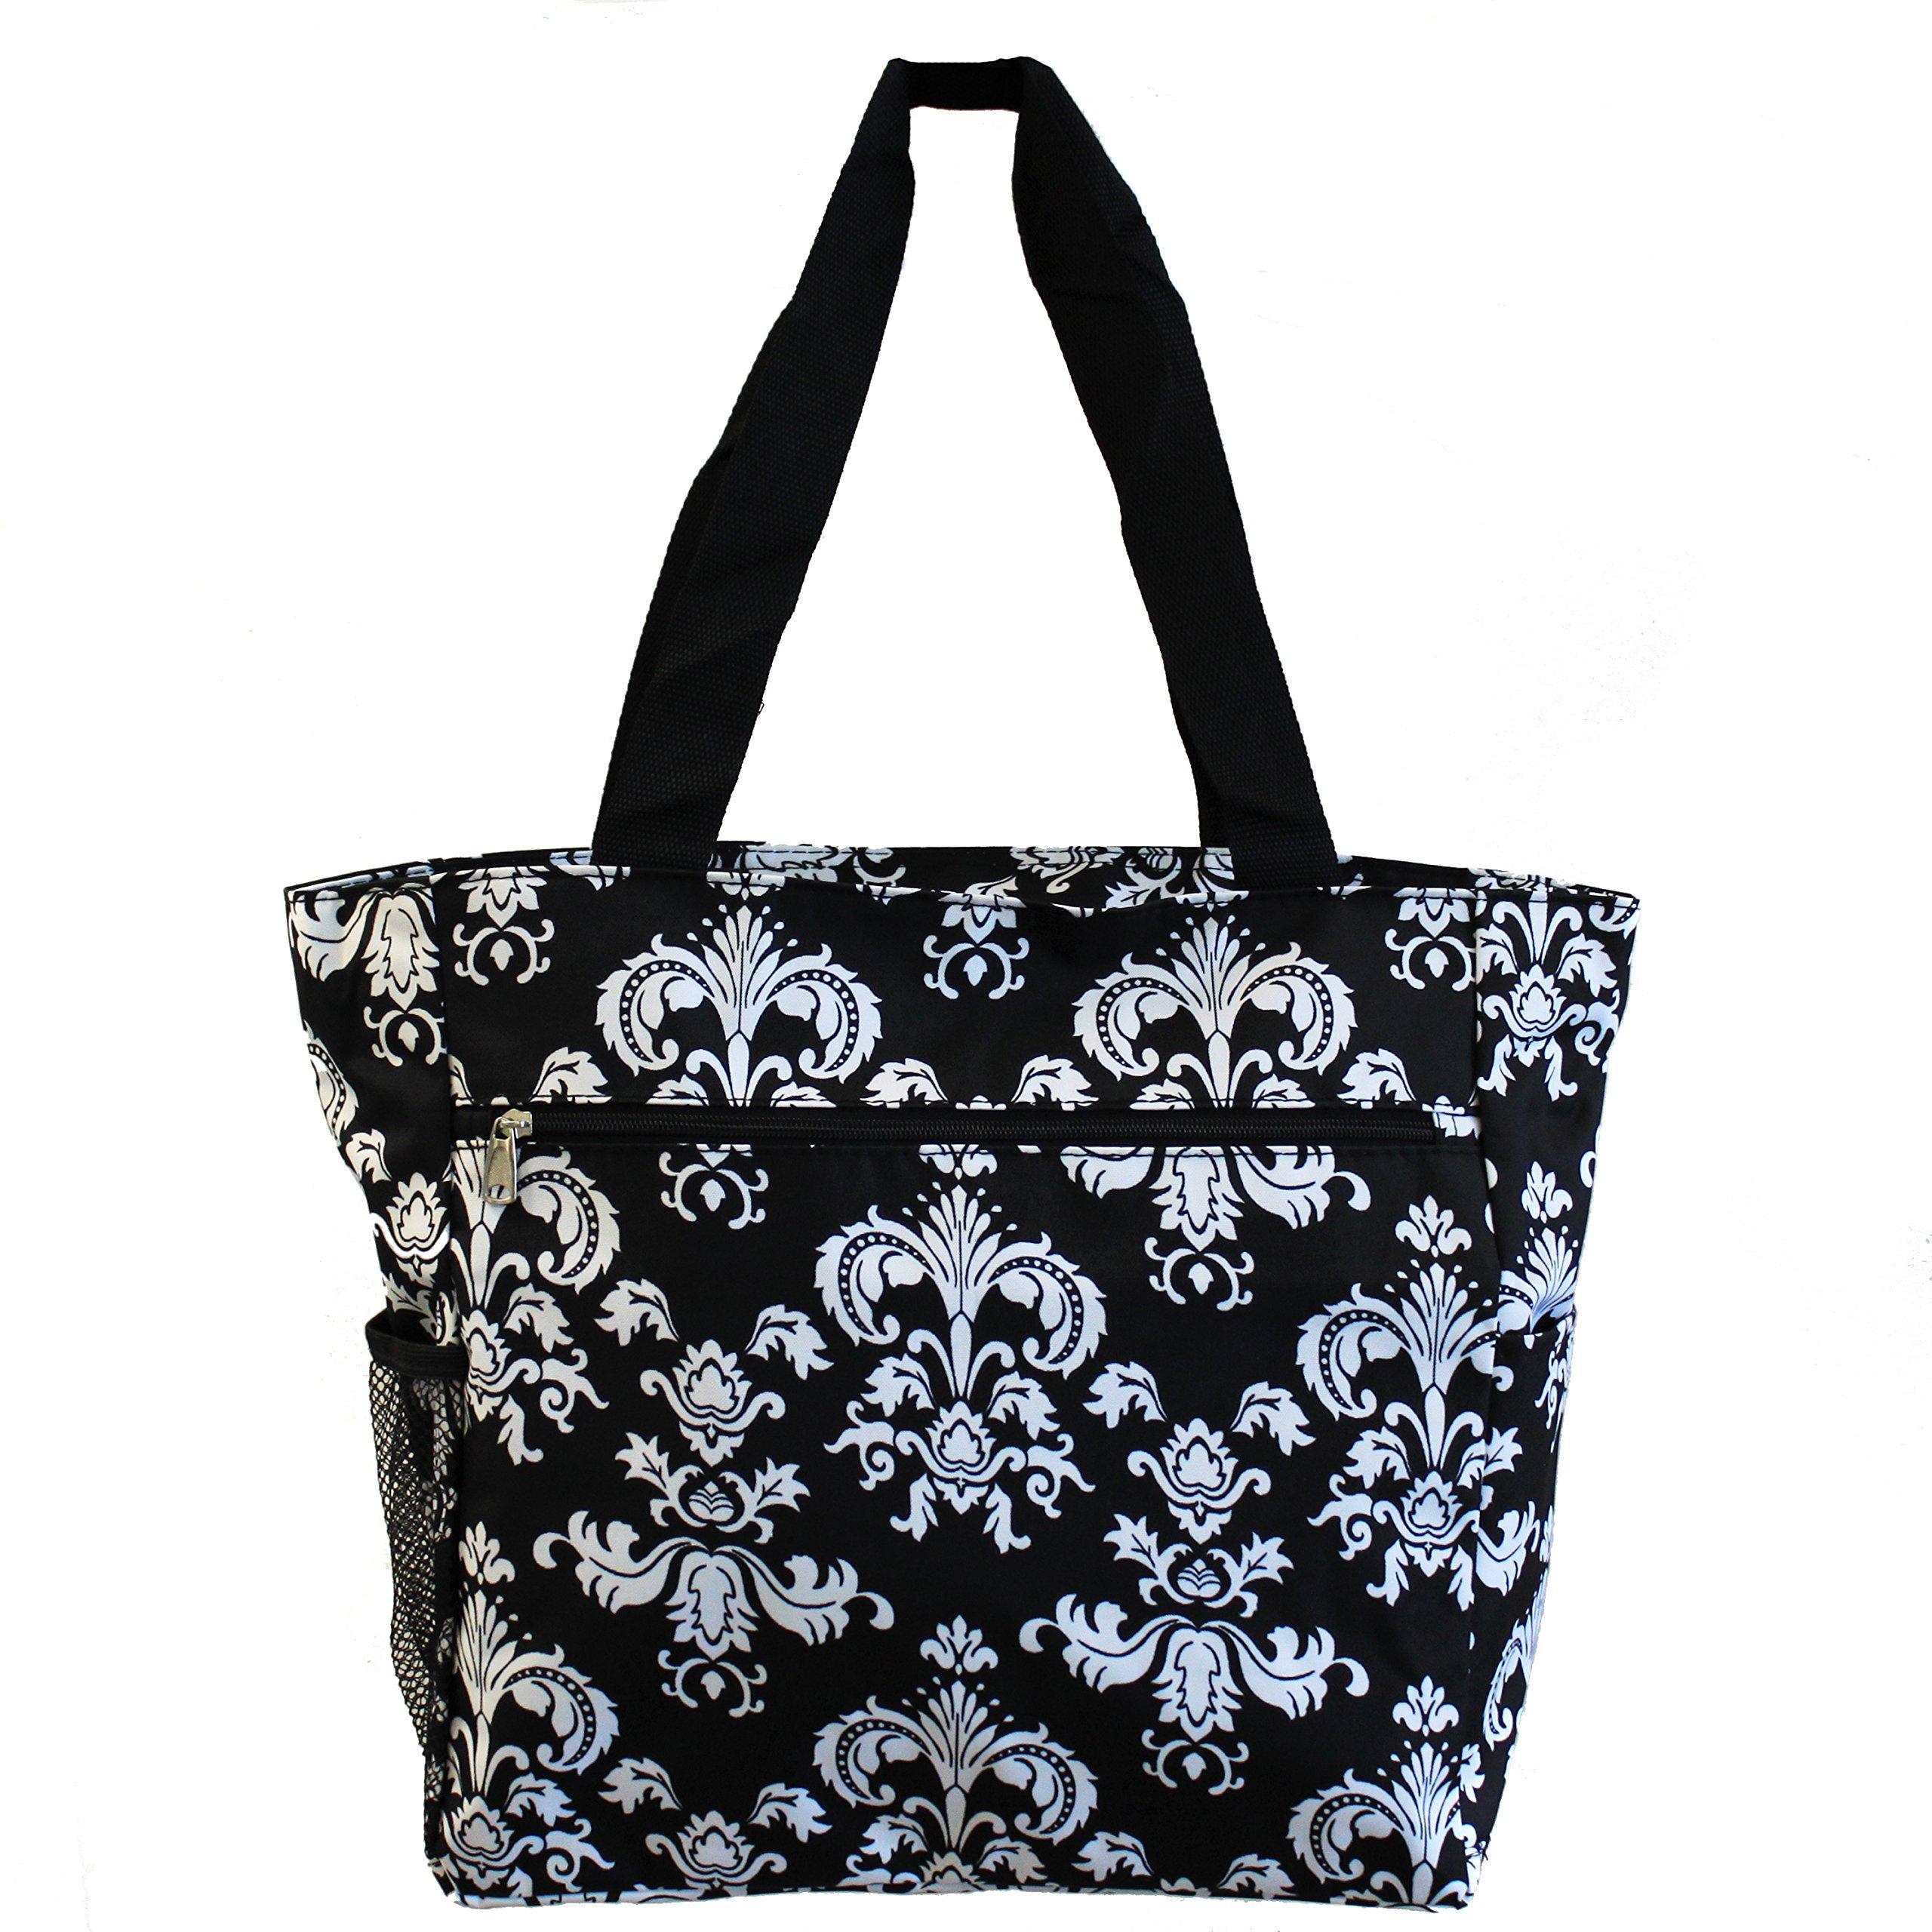 World Traveler 13.5 Inch Beach Bag, Black White Damask II, One Size